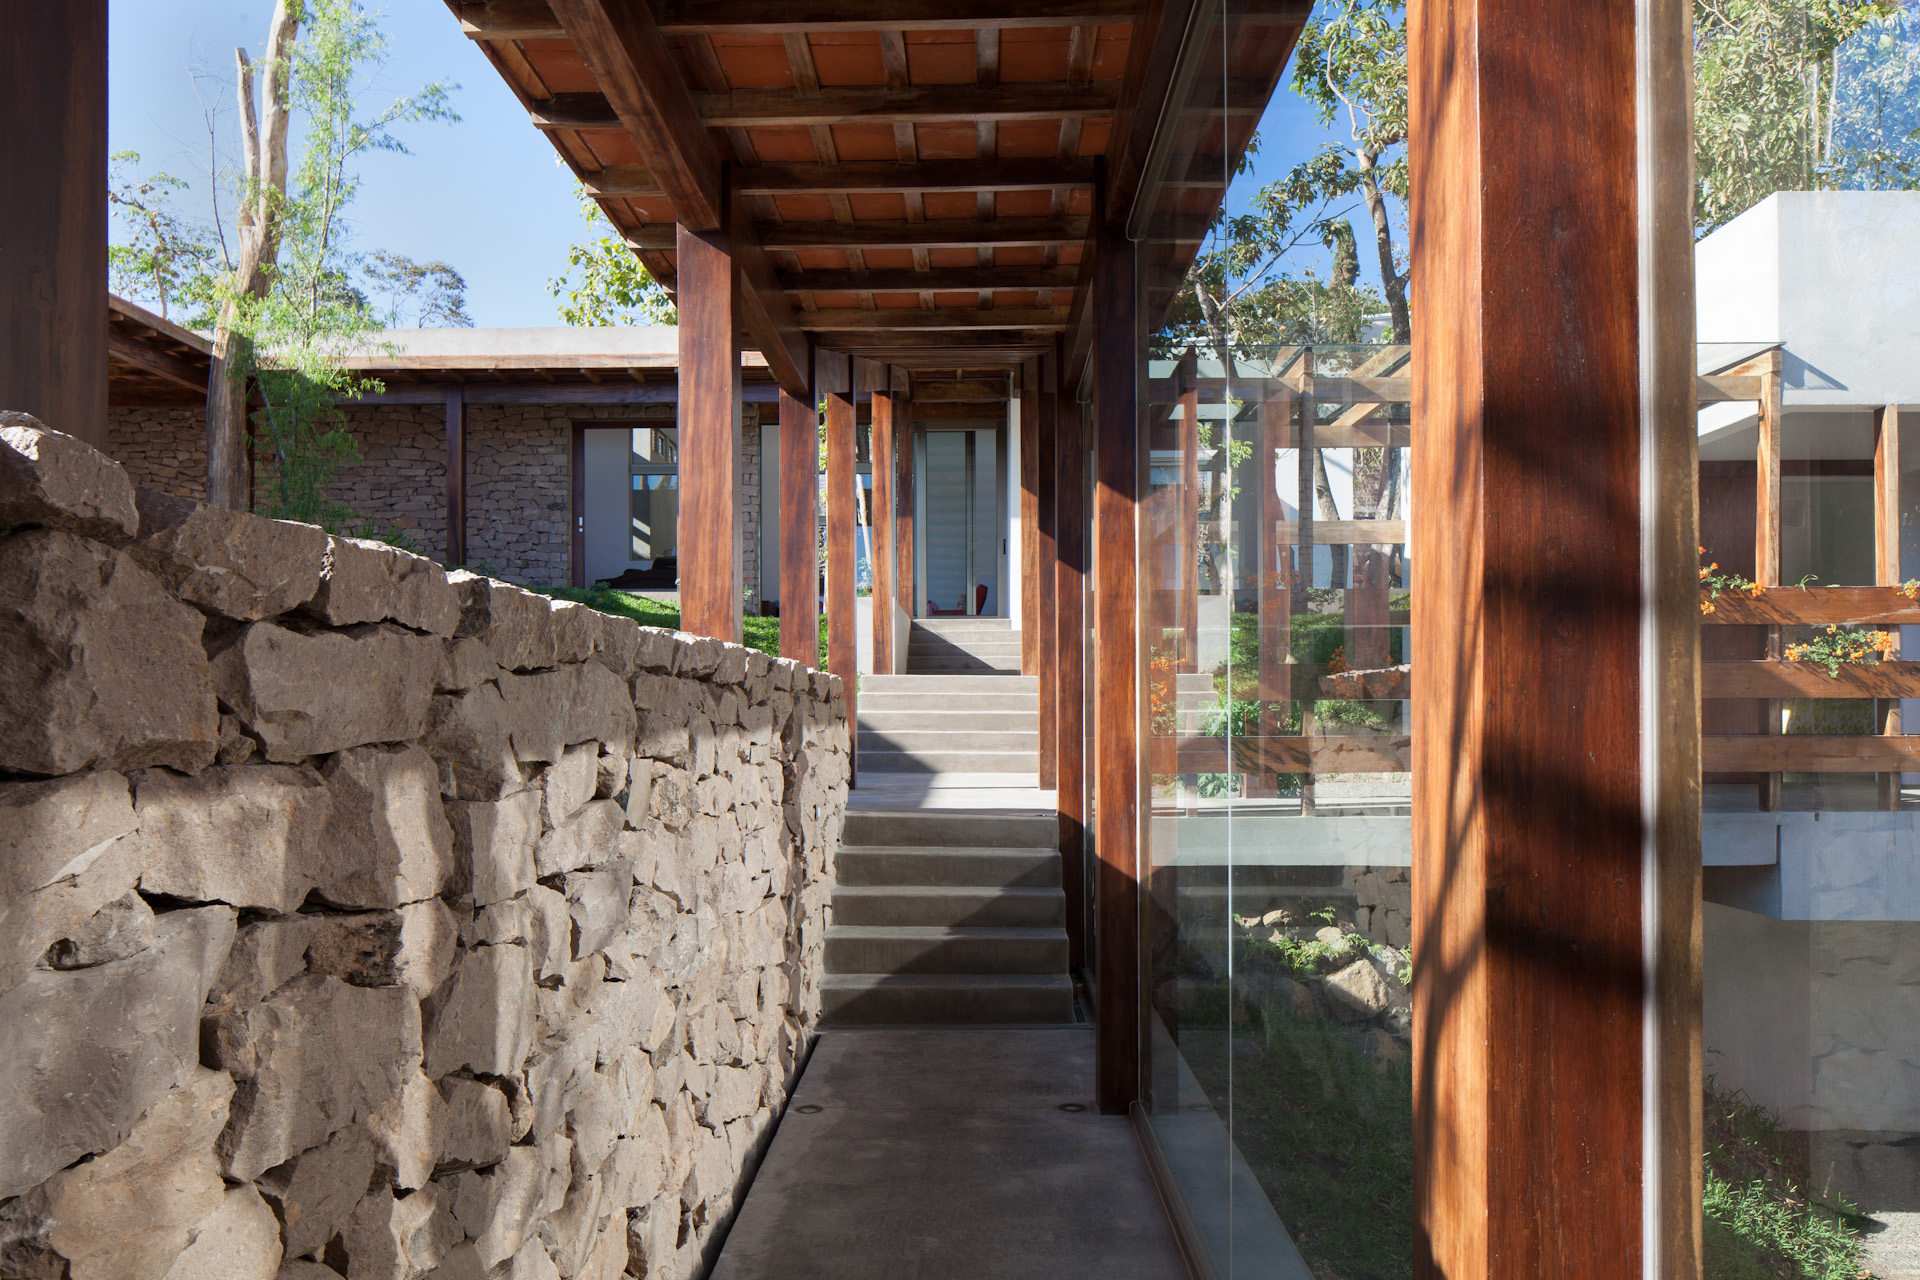 Architecture-Modern-Casa-Jardin-El-Salvador-Interior-07.JPG